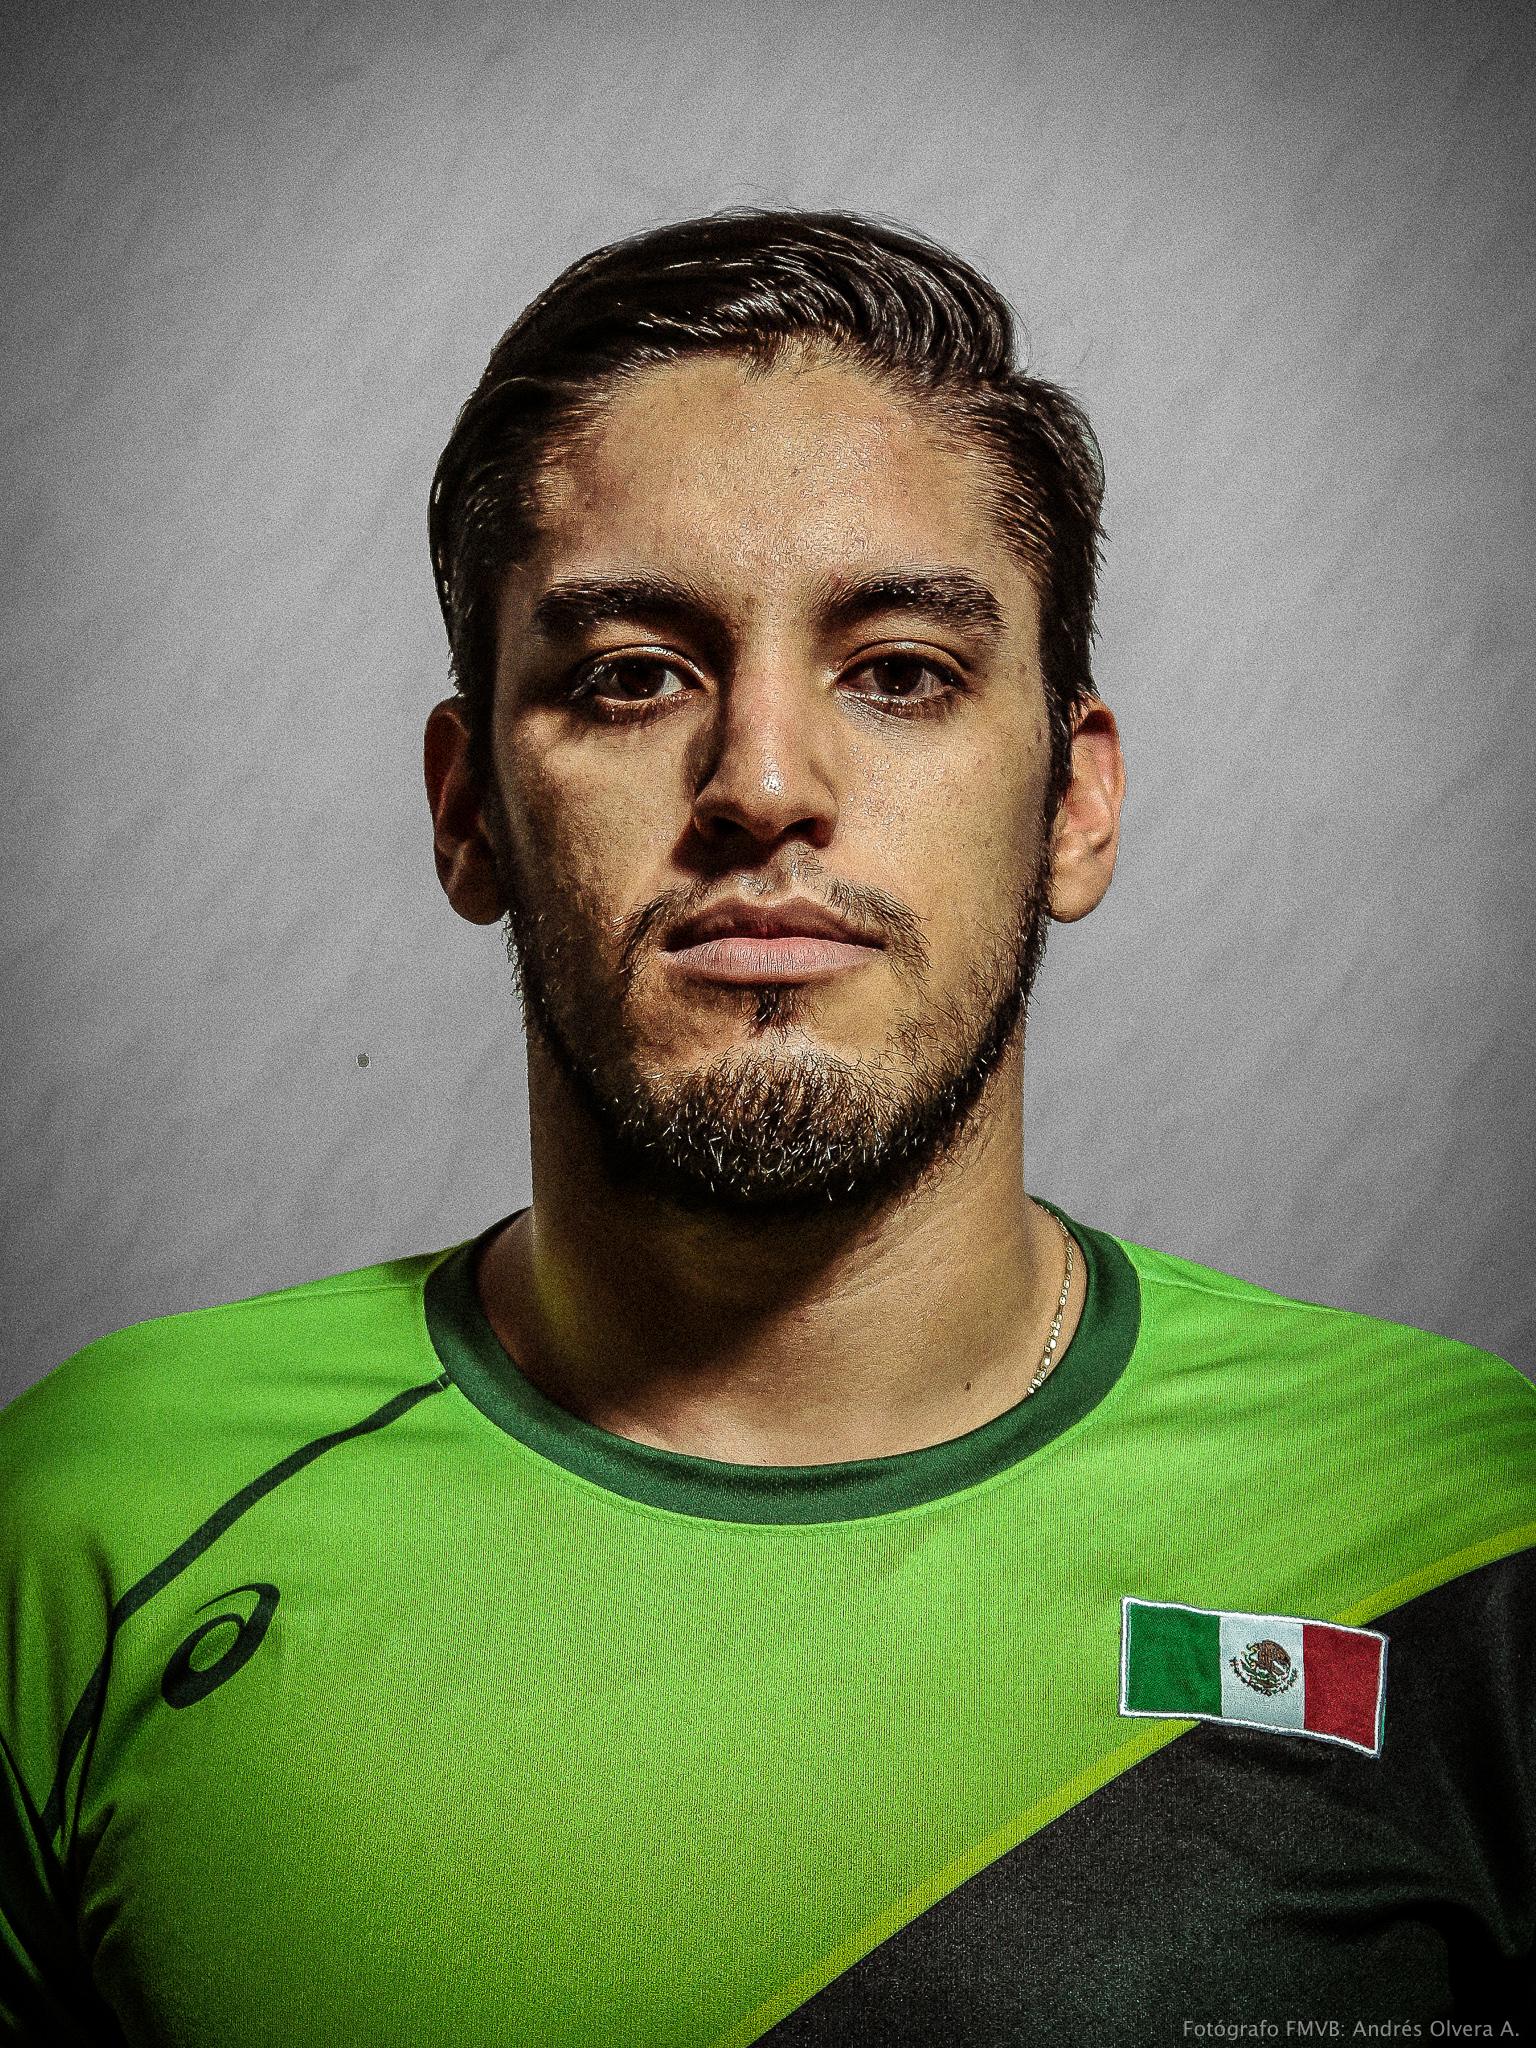 Pedro Rangel (volleyball) Player Pedro Rangel